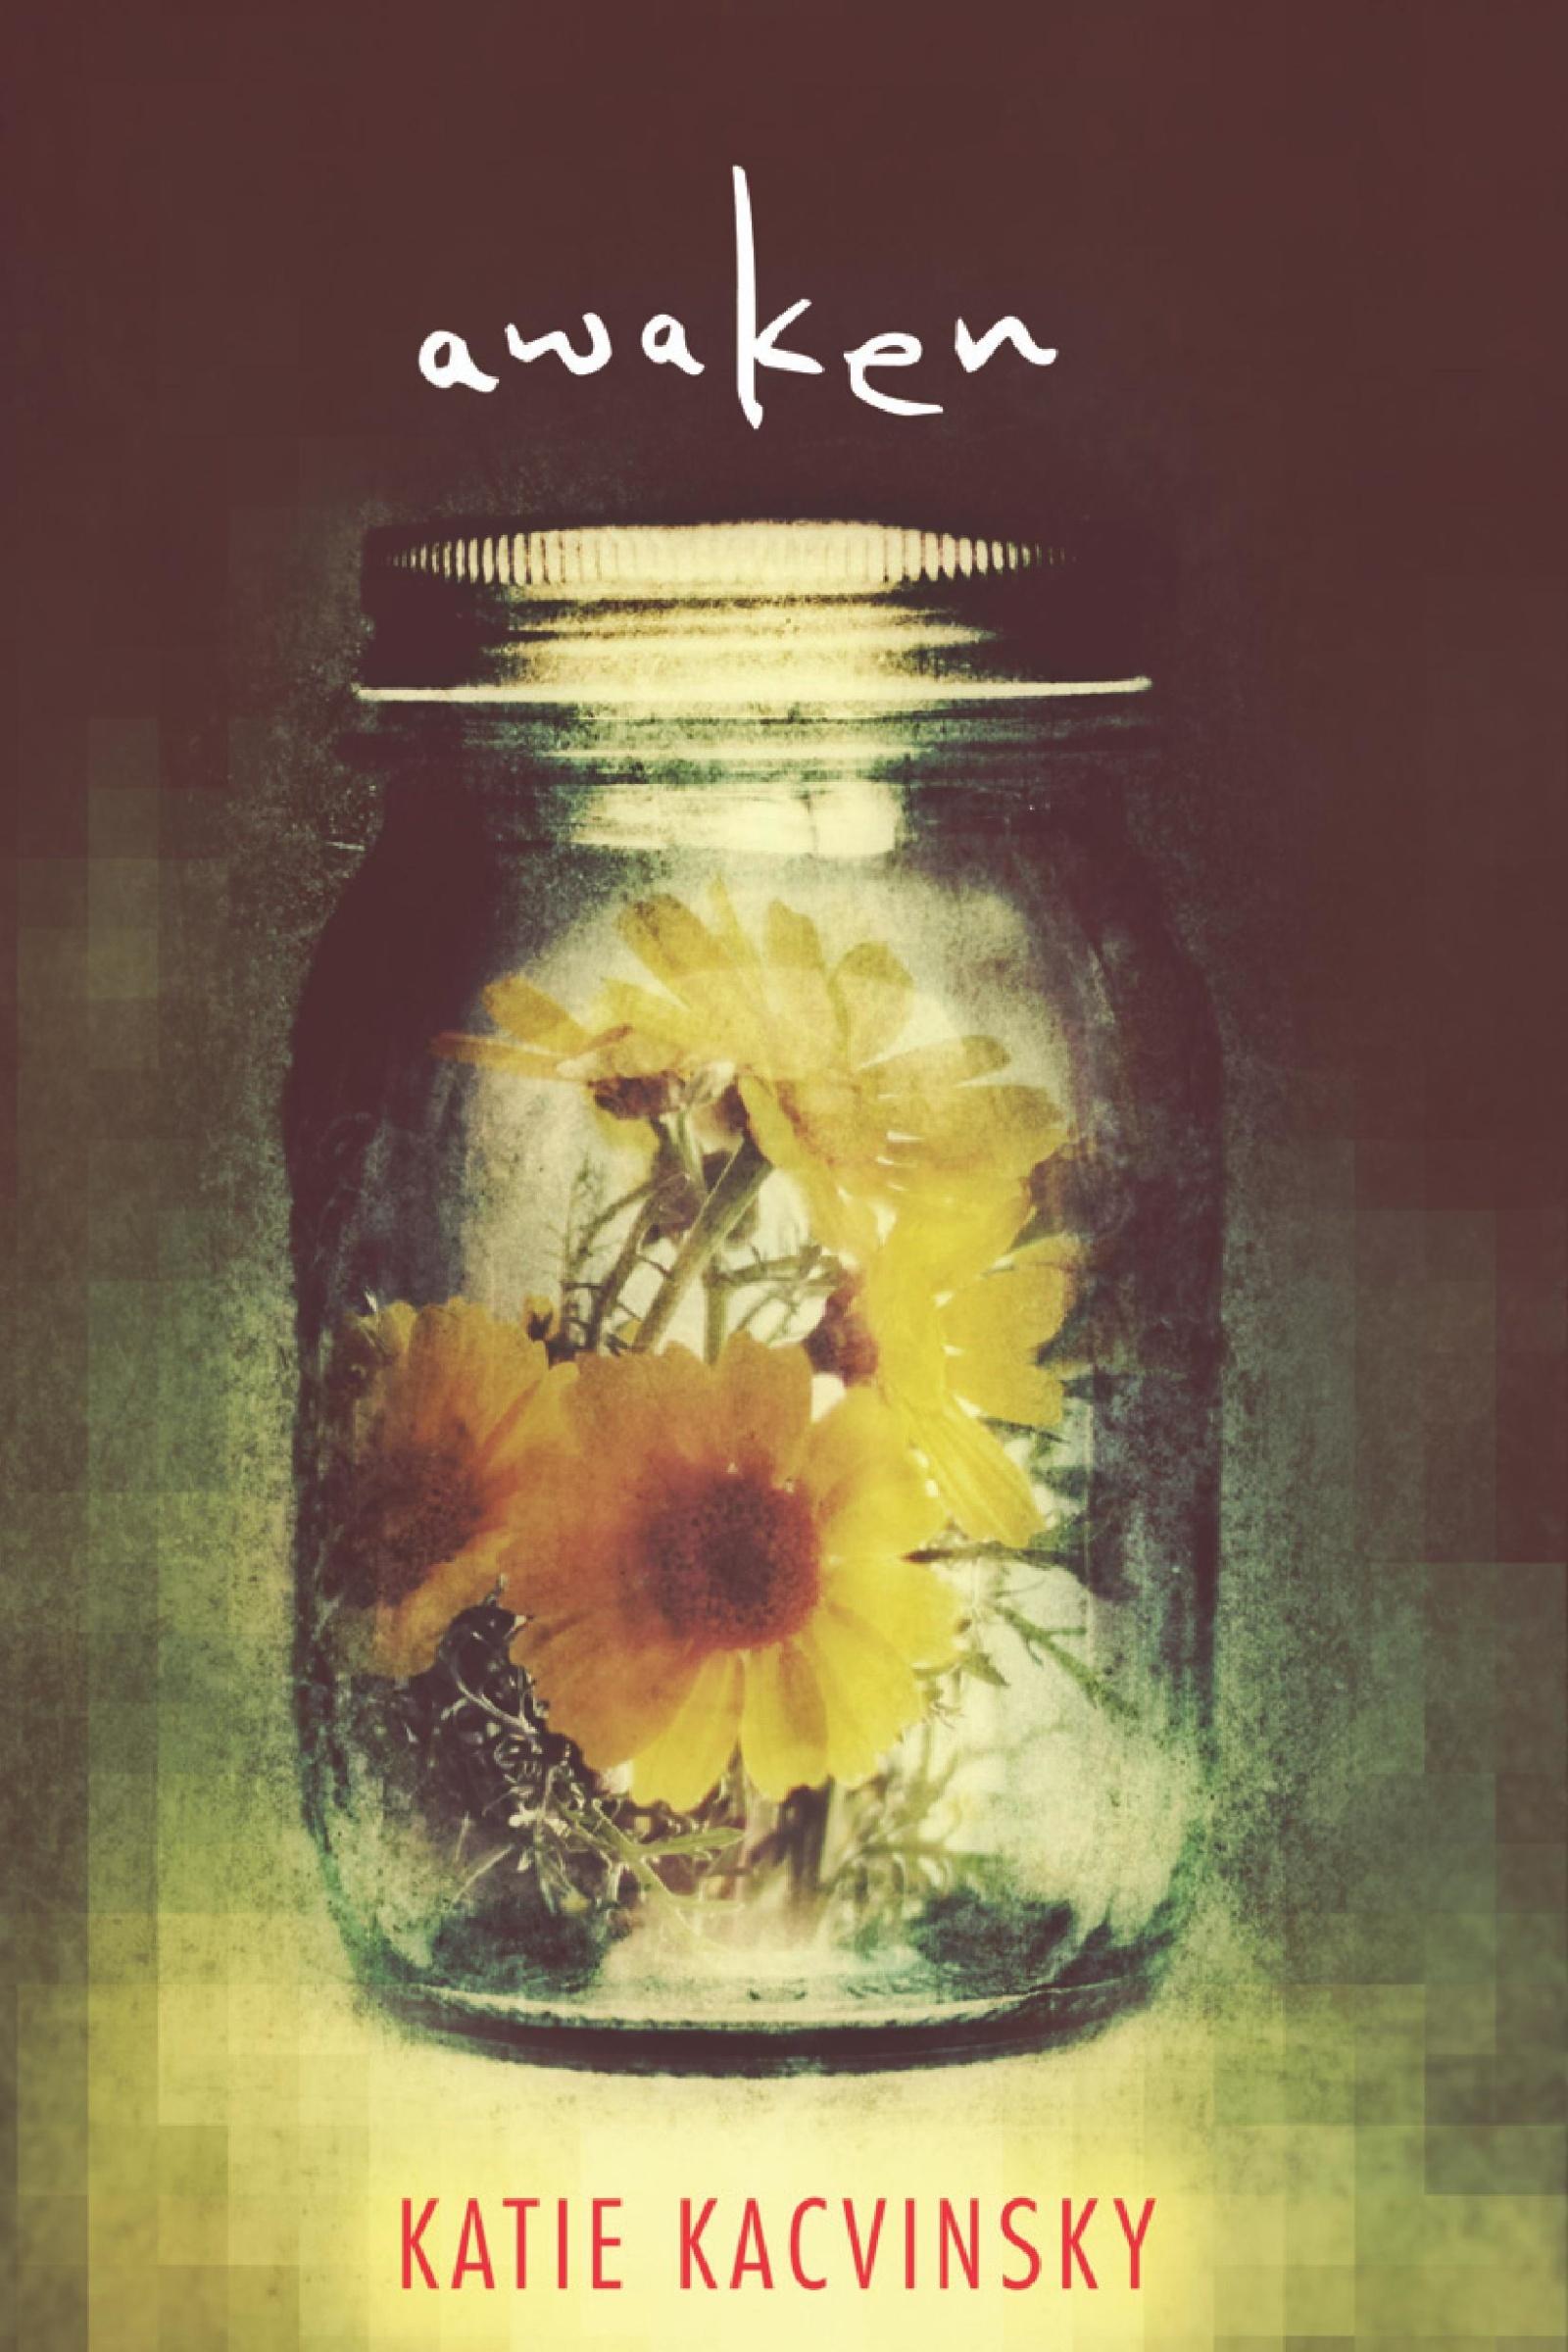 Cover Image of Awaken